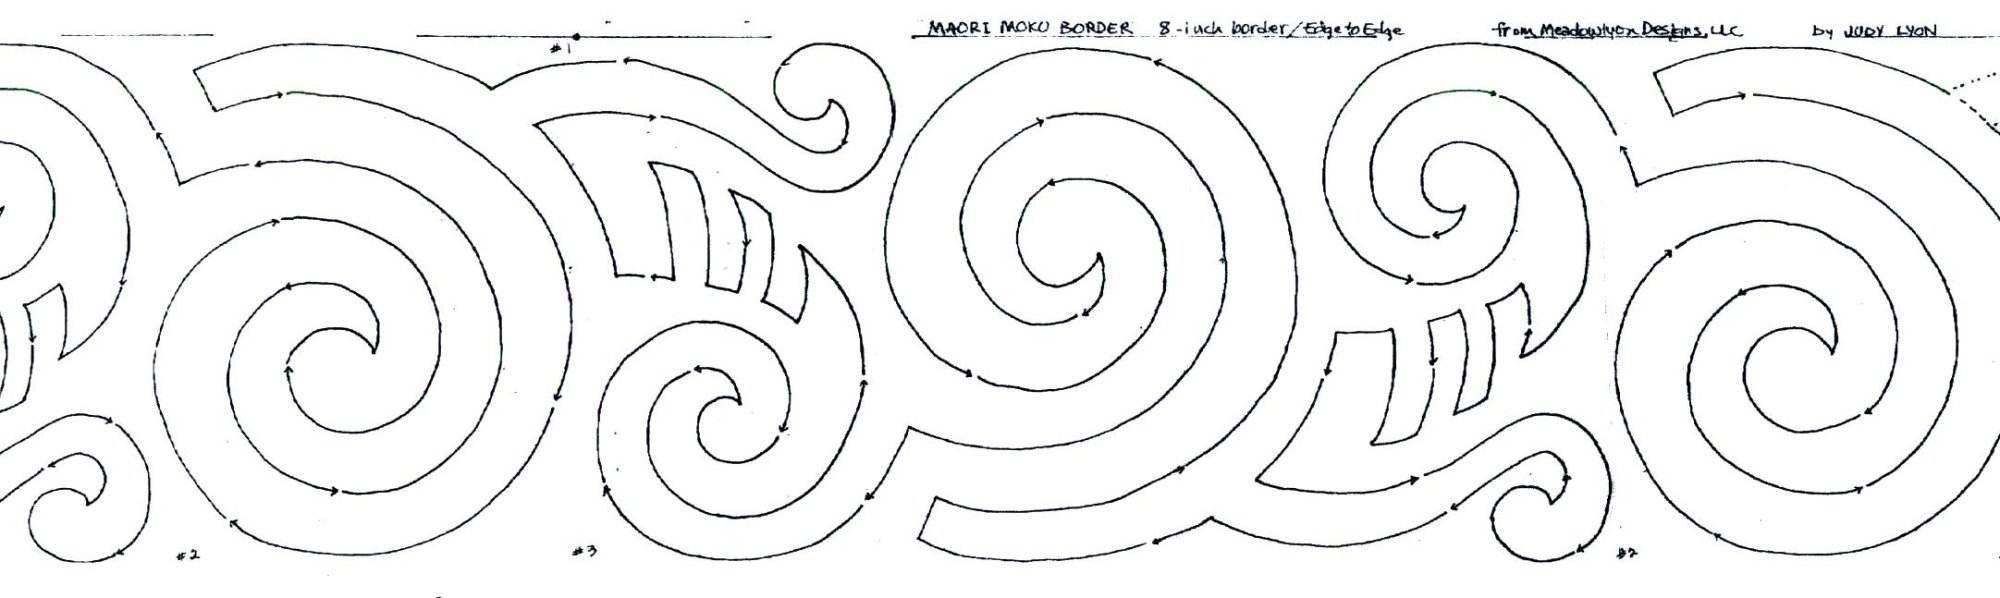 42 Maori Moko Set Meadowlyon Designs